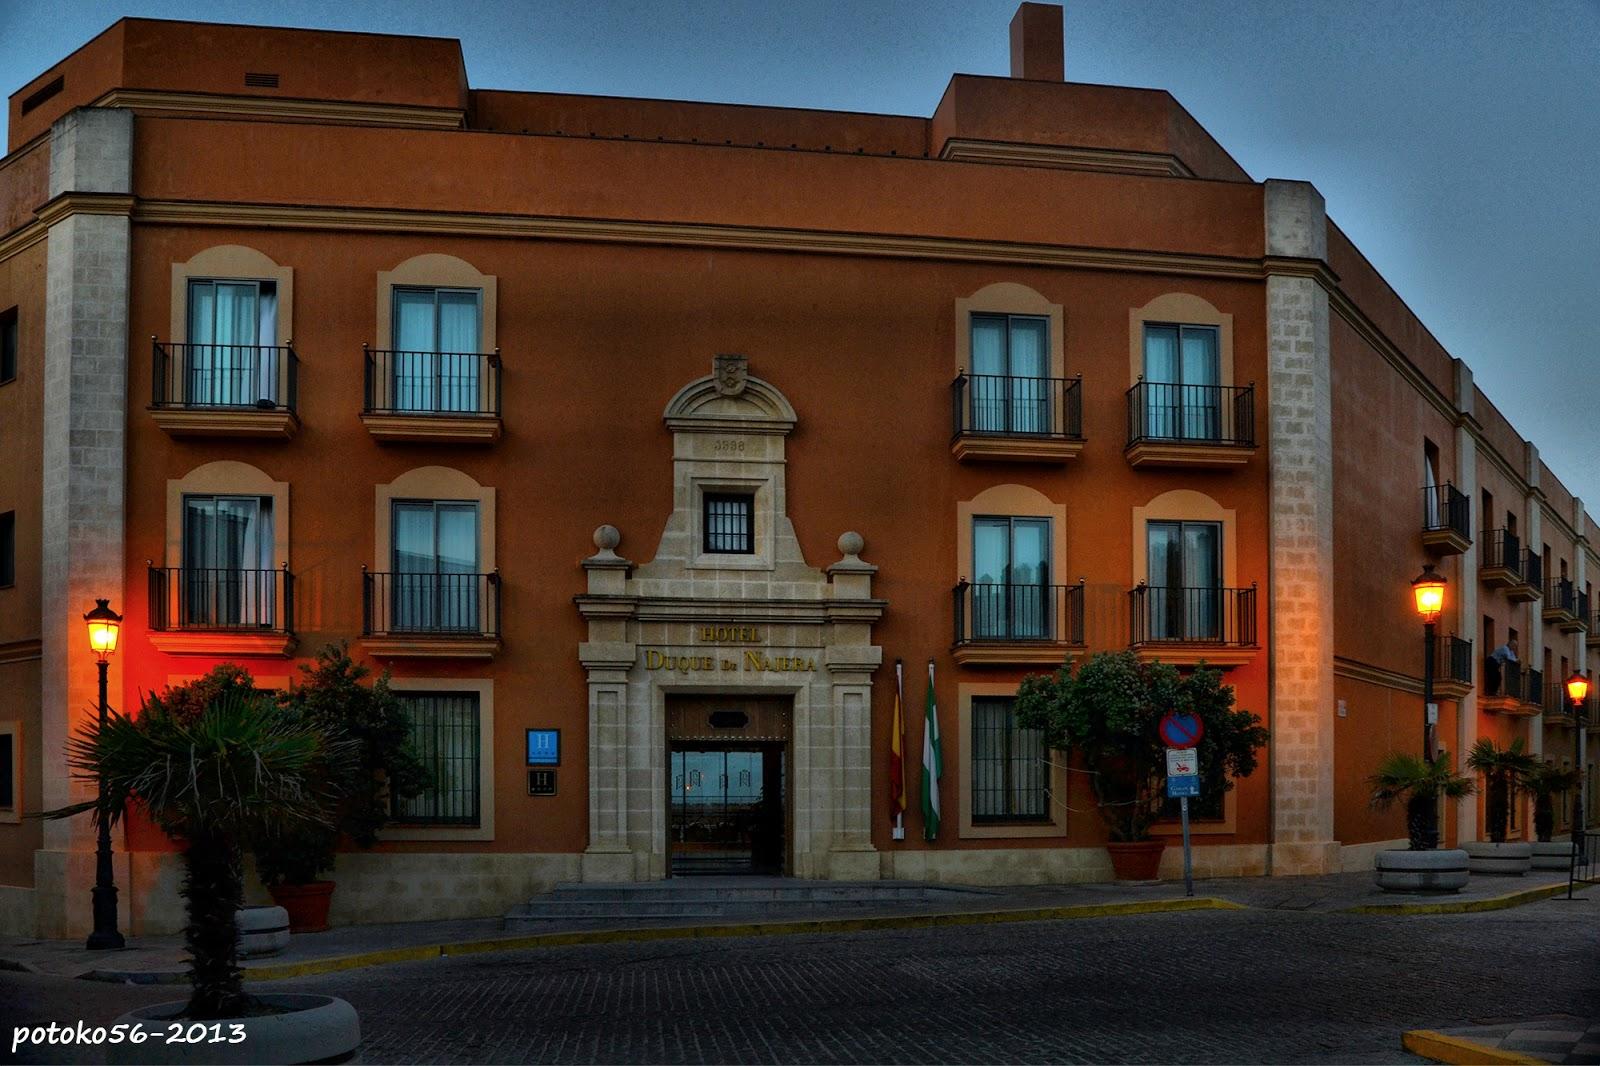 Hoteles con Encanto Duque de Najera**** Rota